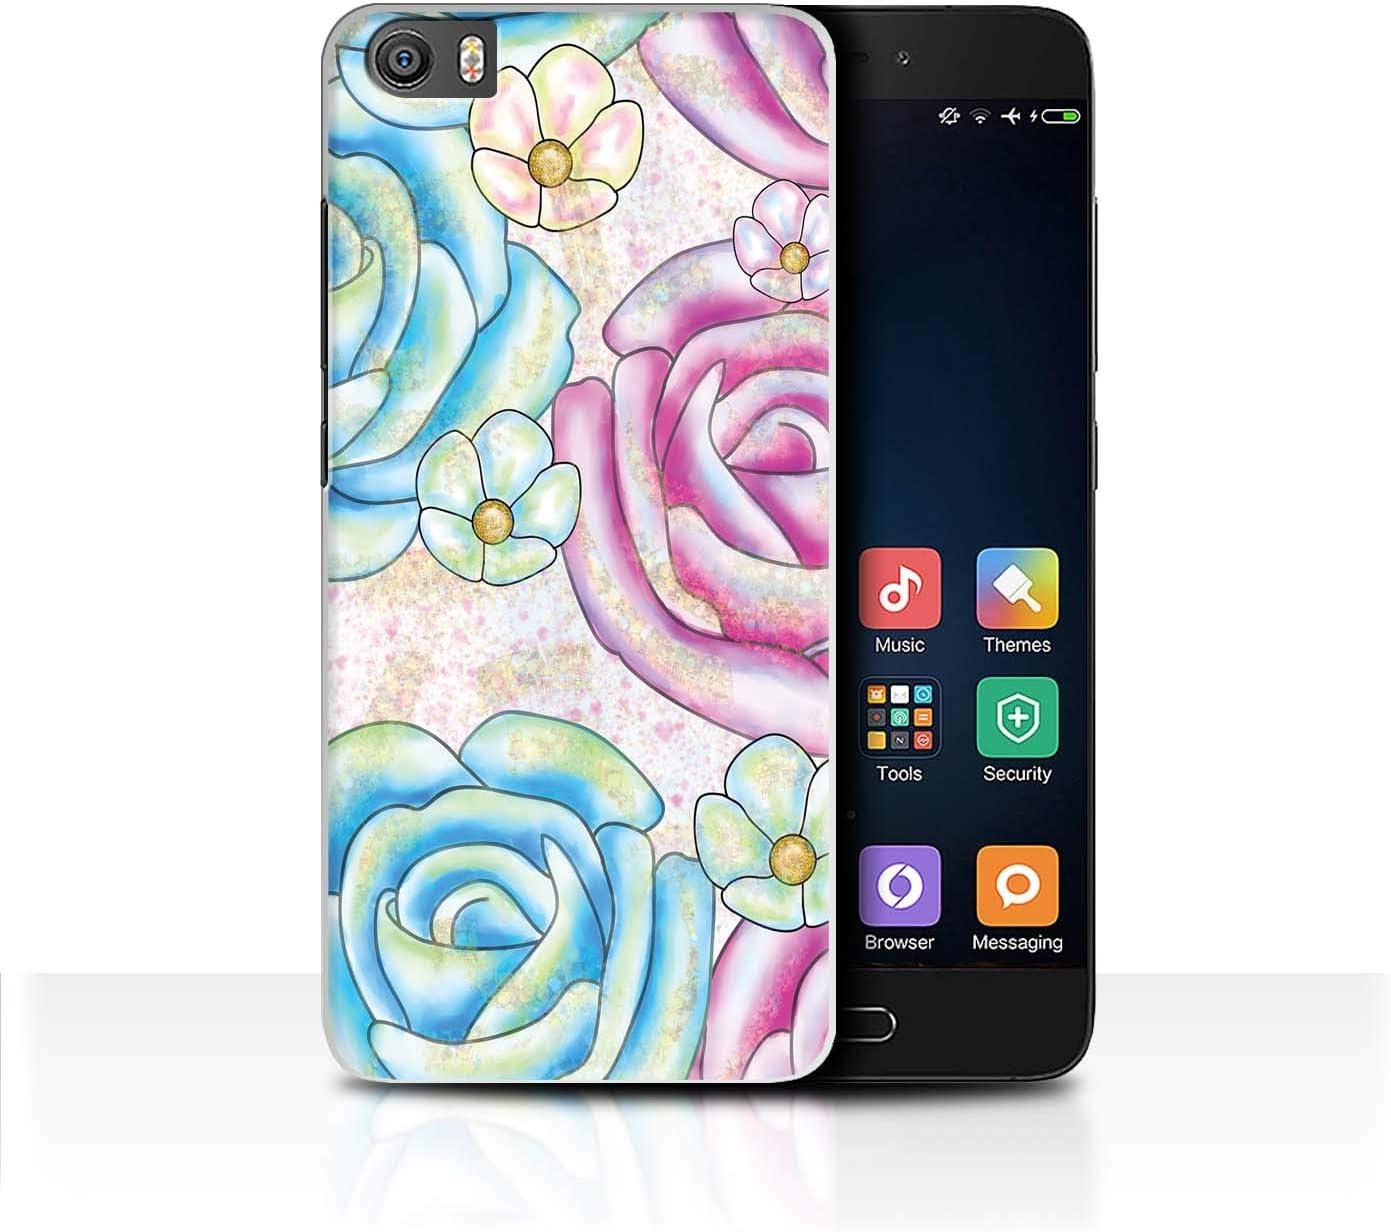 eSwish Carcasa/Funda Dura para el Xiaomi Mi5/Mi 5 / Serie: Fiesta Unicornio - Flores Rosas